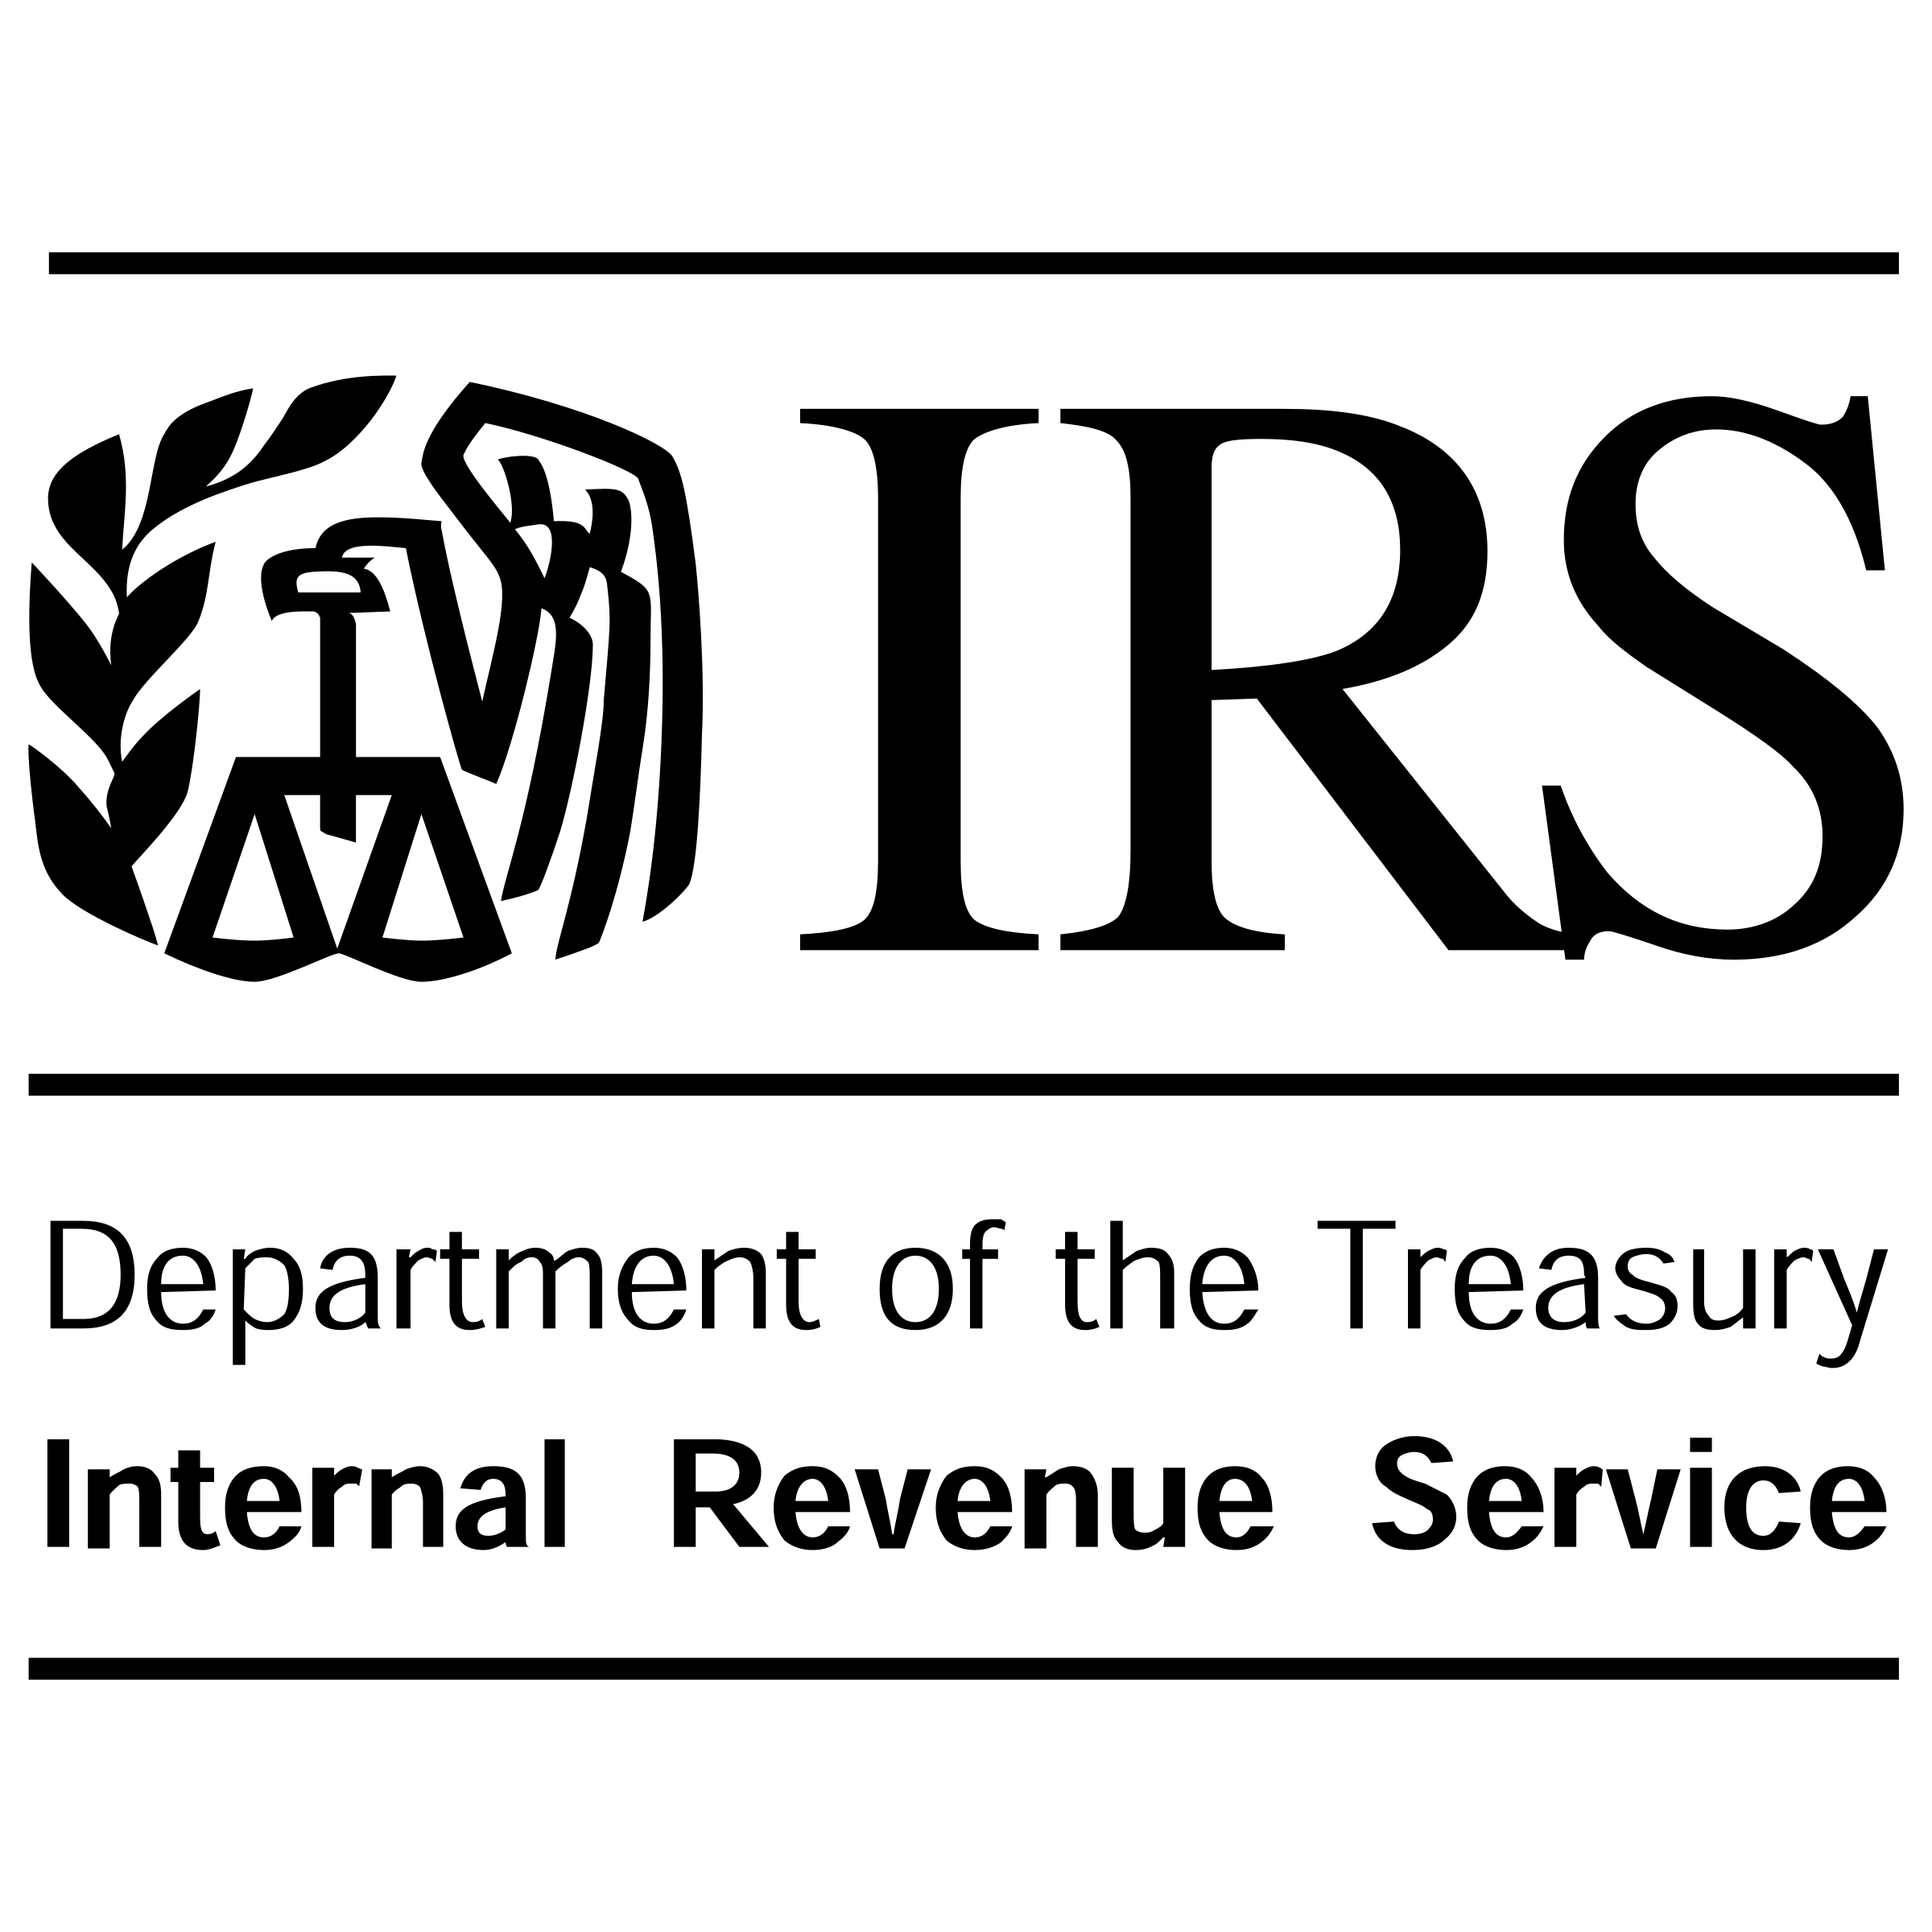 IRS Logo PNG Transparent & SVG Vector.